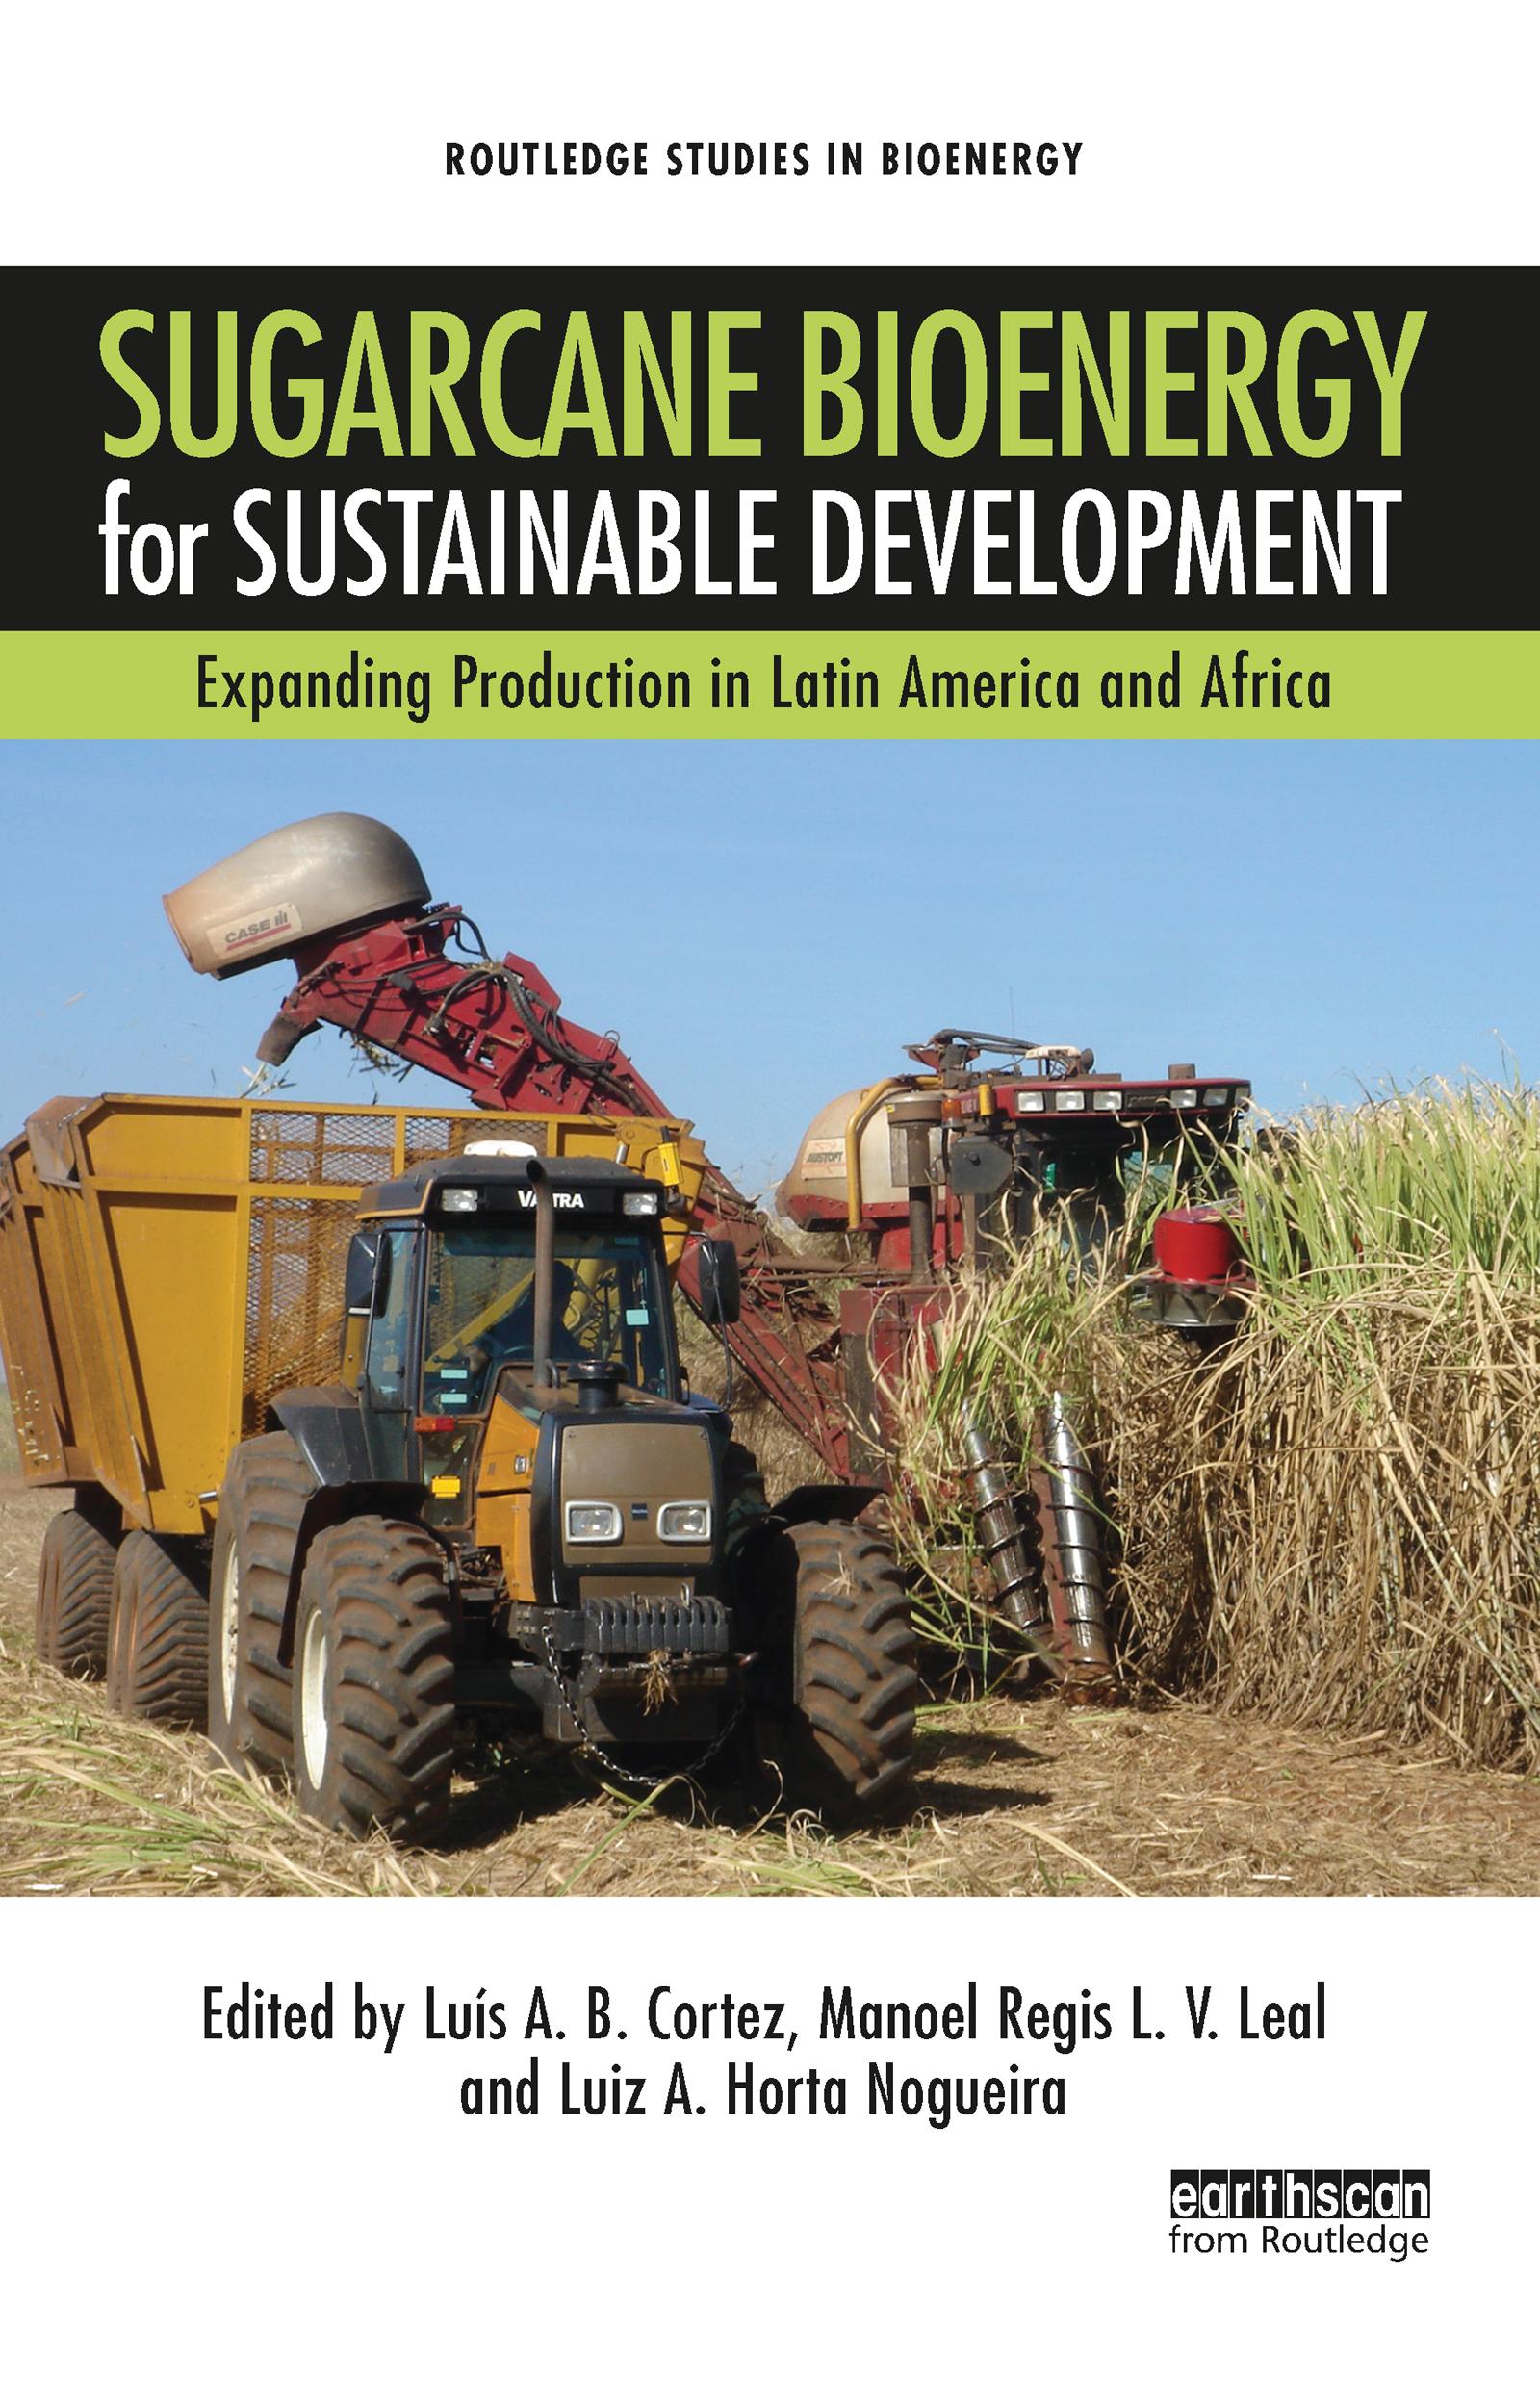 Sugarcane Bioenergy for Sustainable Development